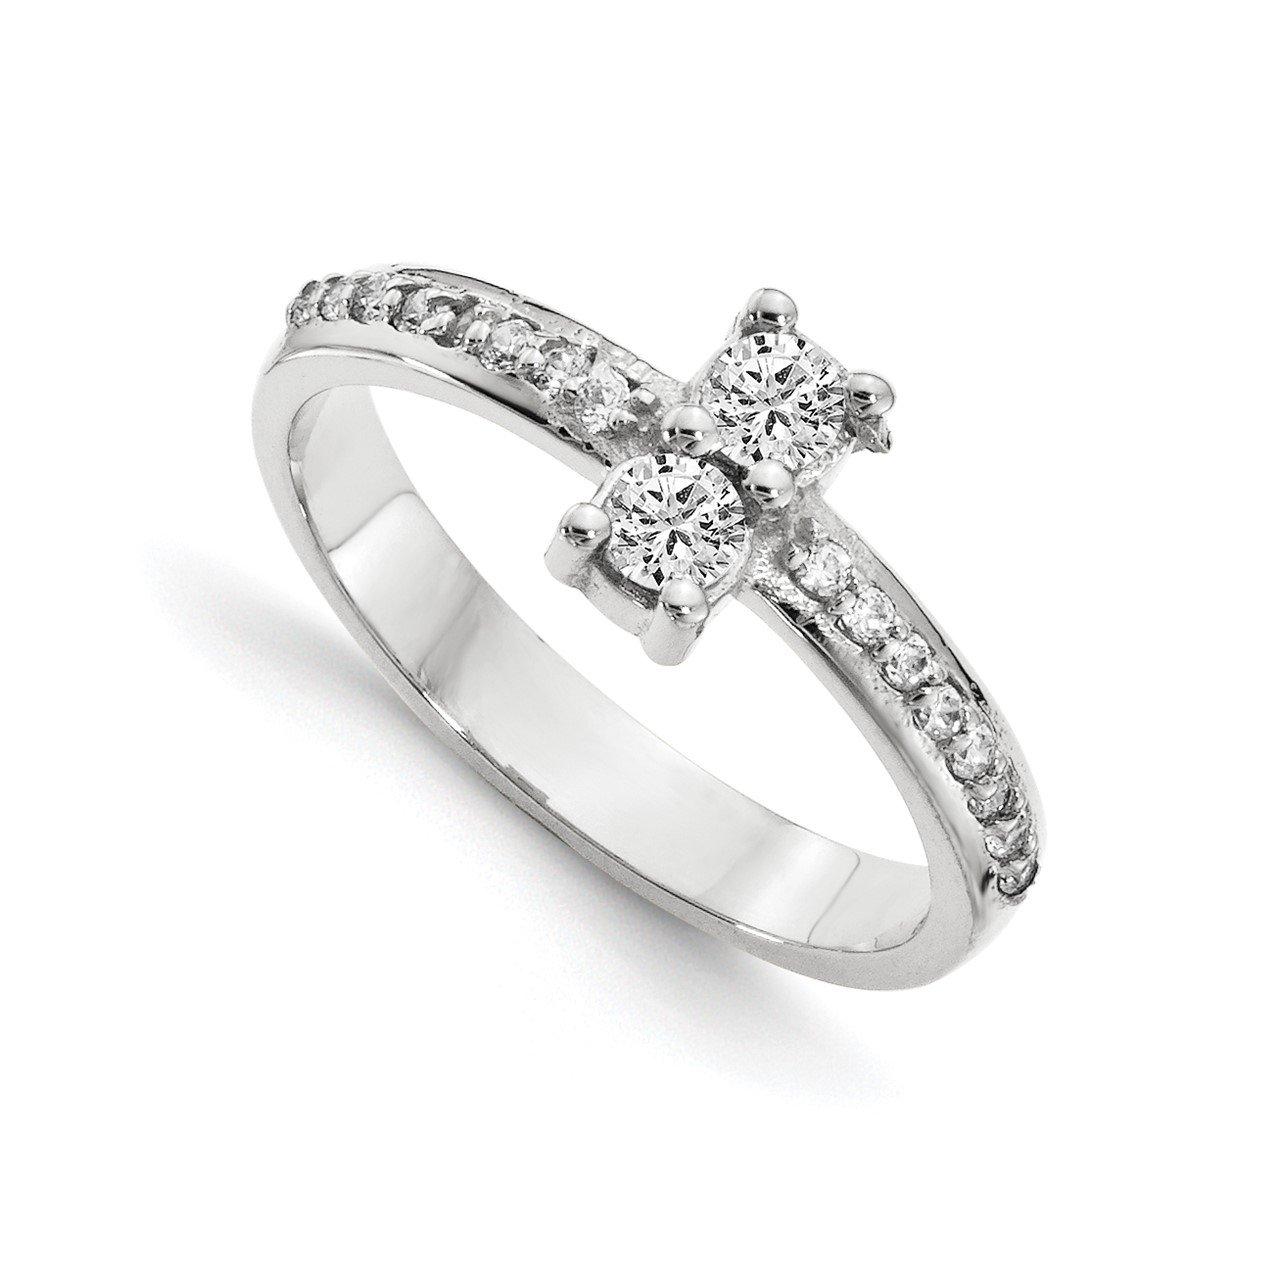 14KW VS Diamond 2-stone Ring Semi-Mount - 2.7 mm center stones